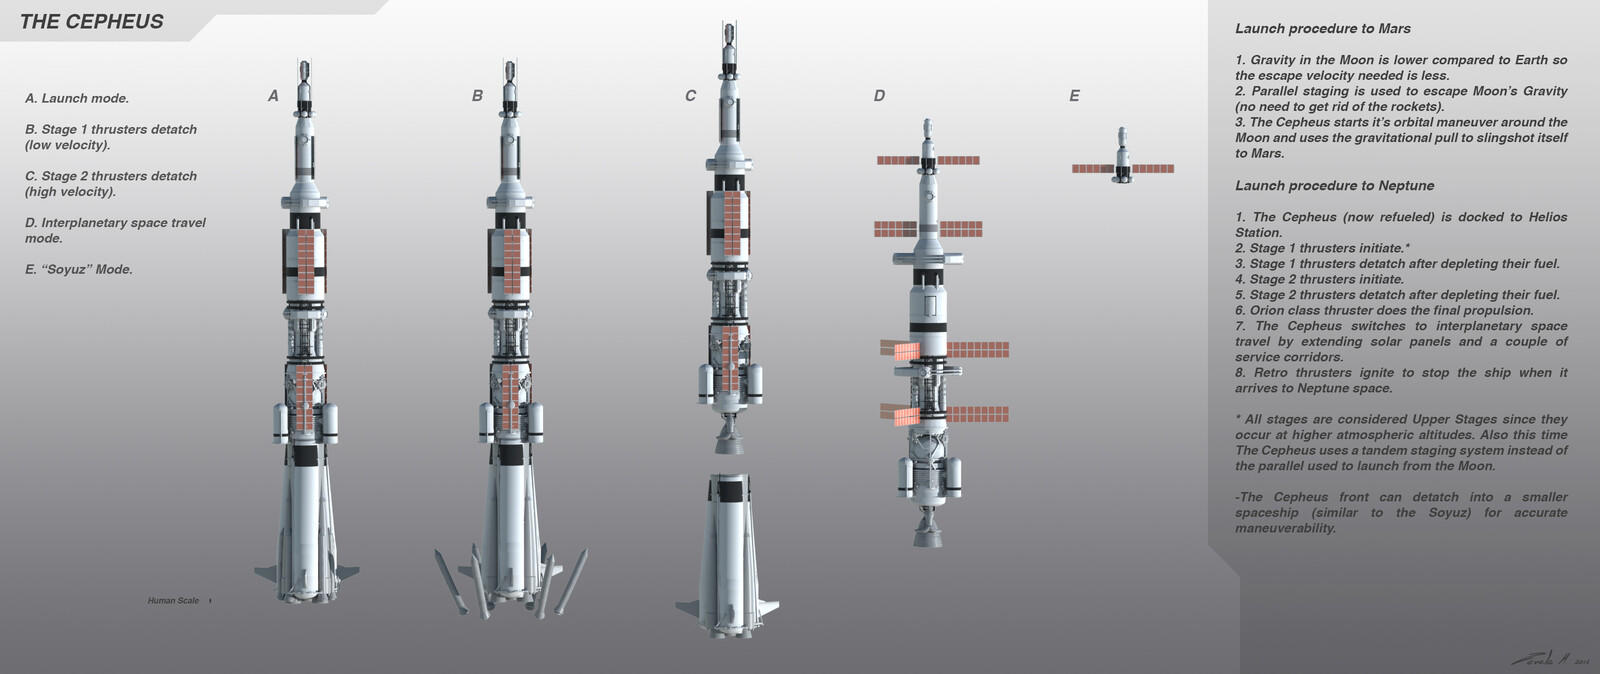 Breakdown of The Cepheus spaceflight capabilities.